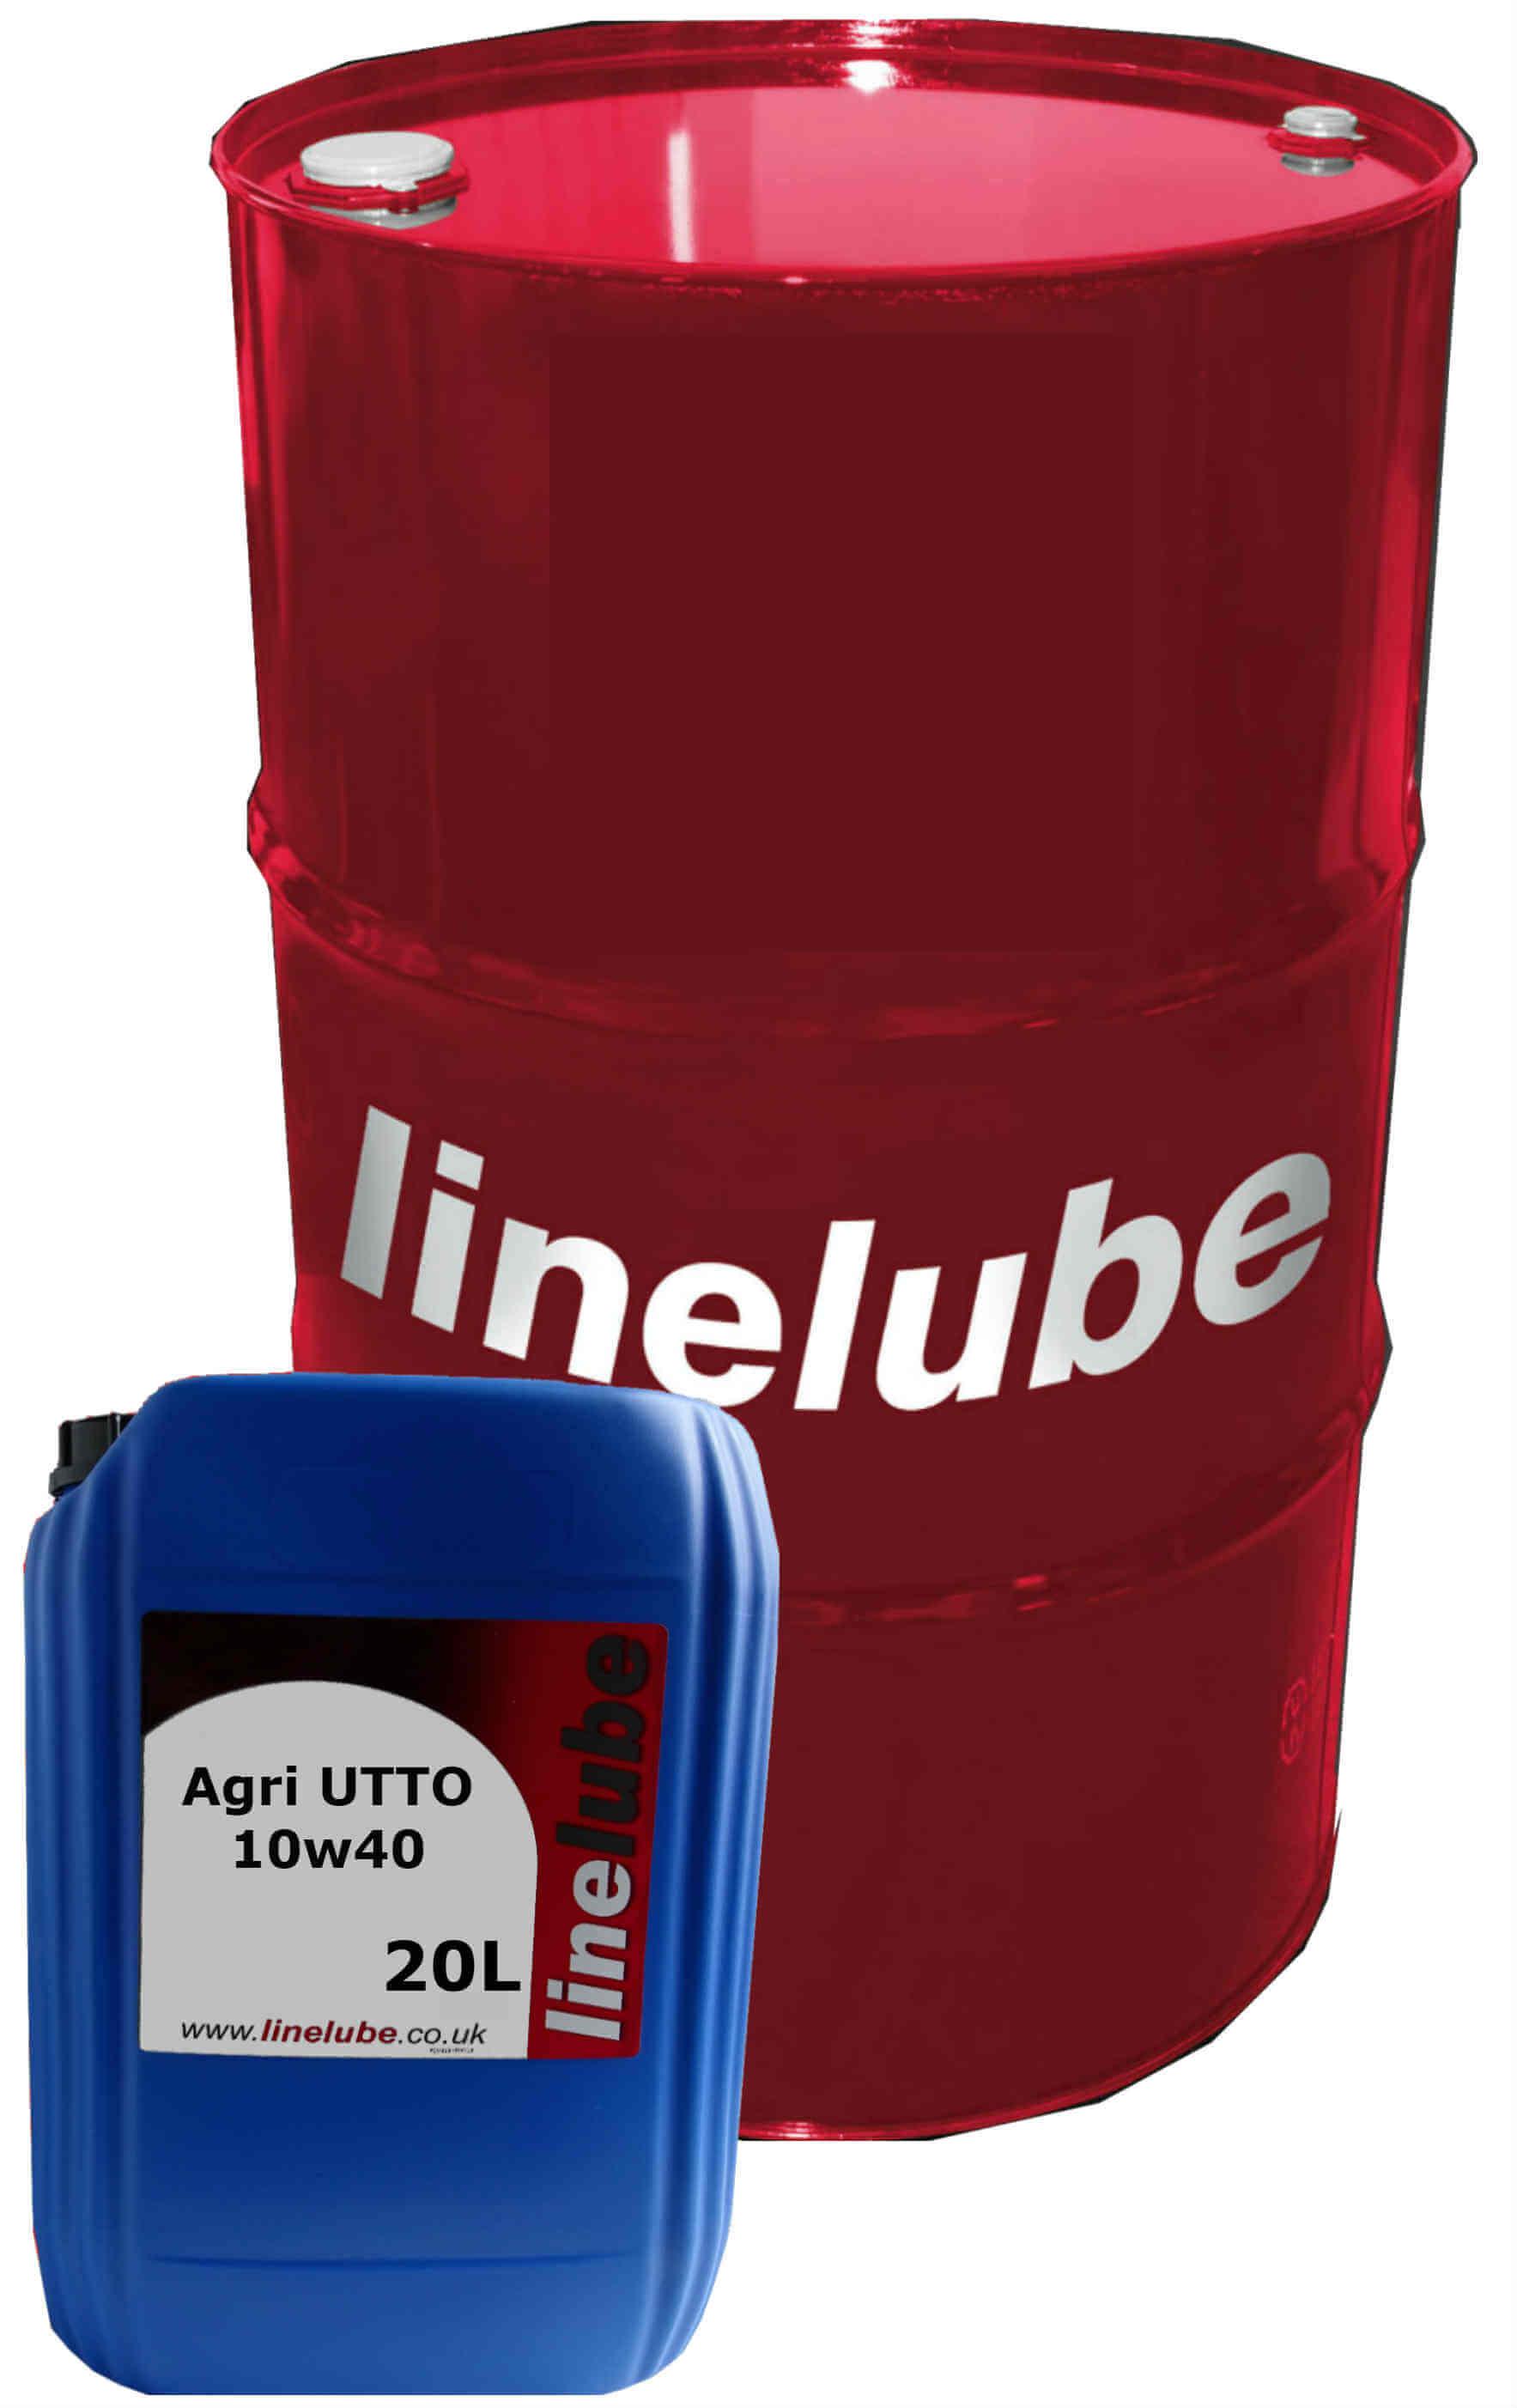 Linelube Agri UTTO 10w40